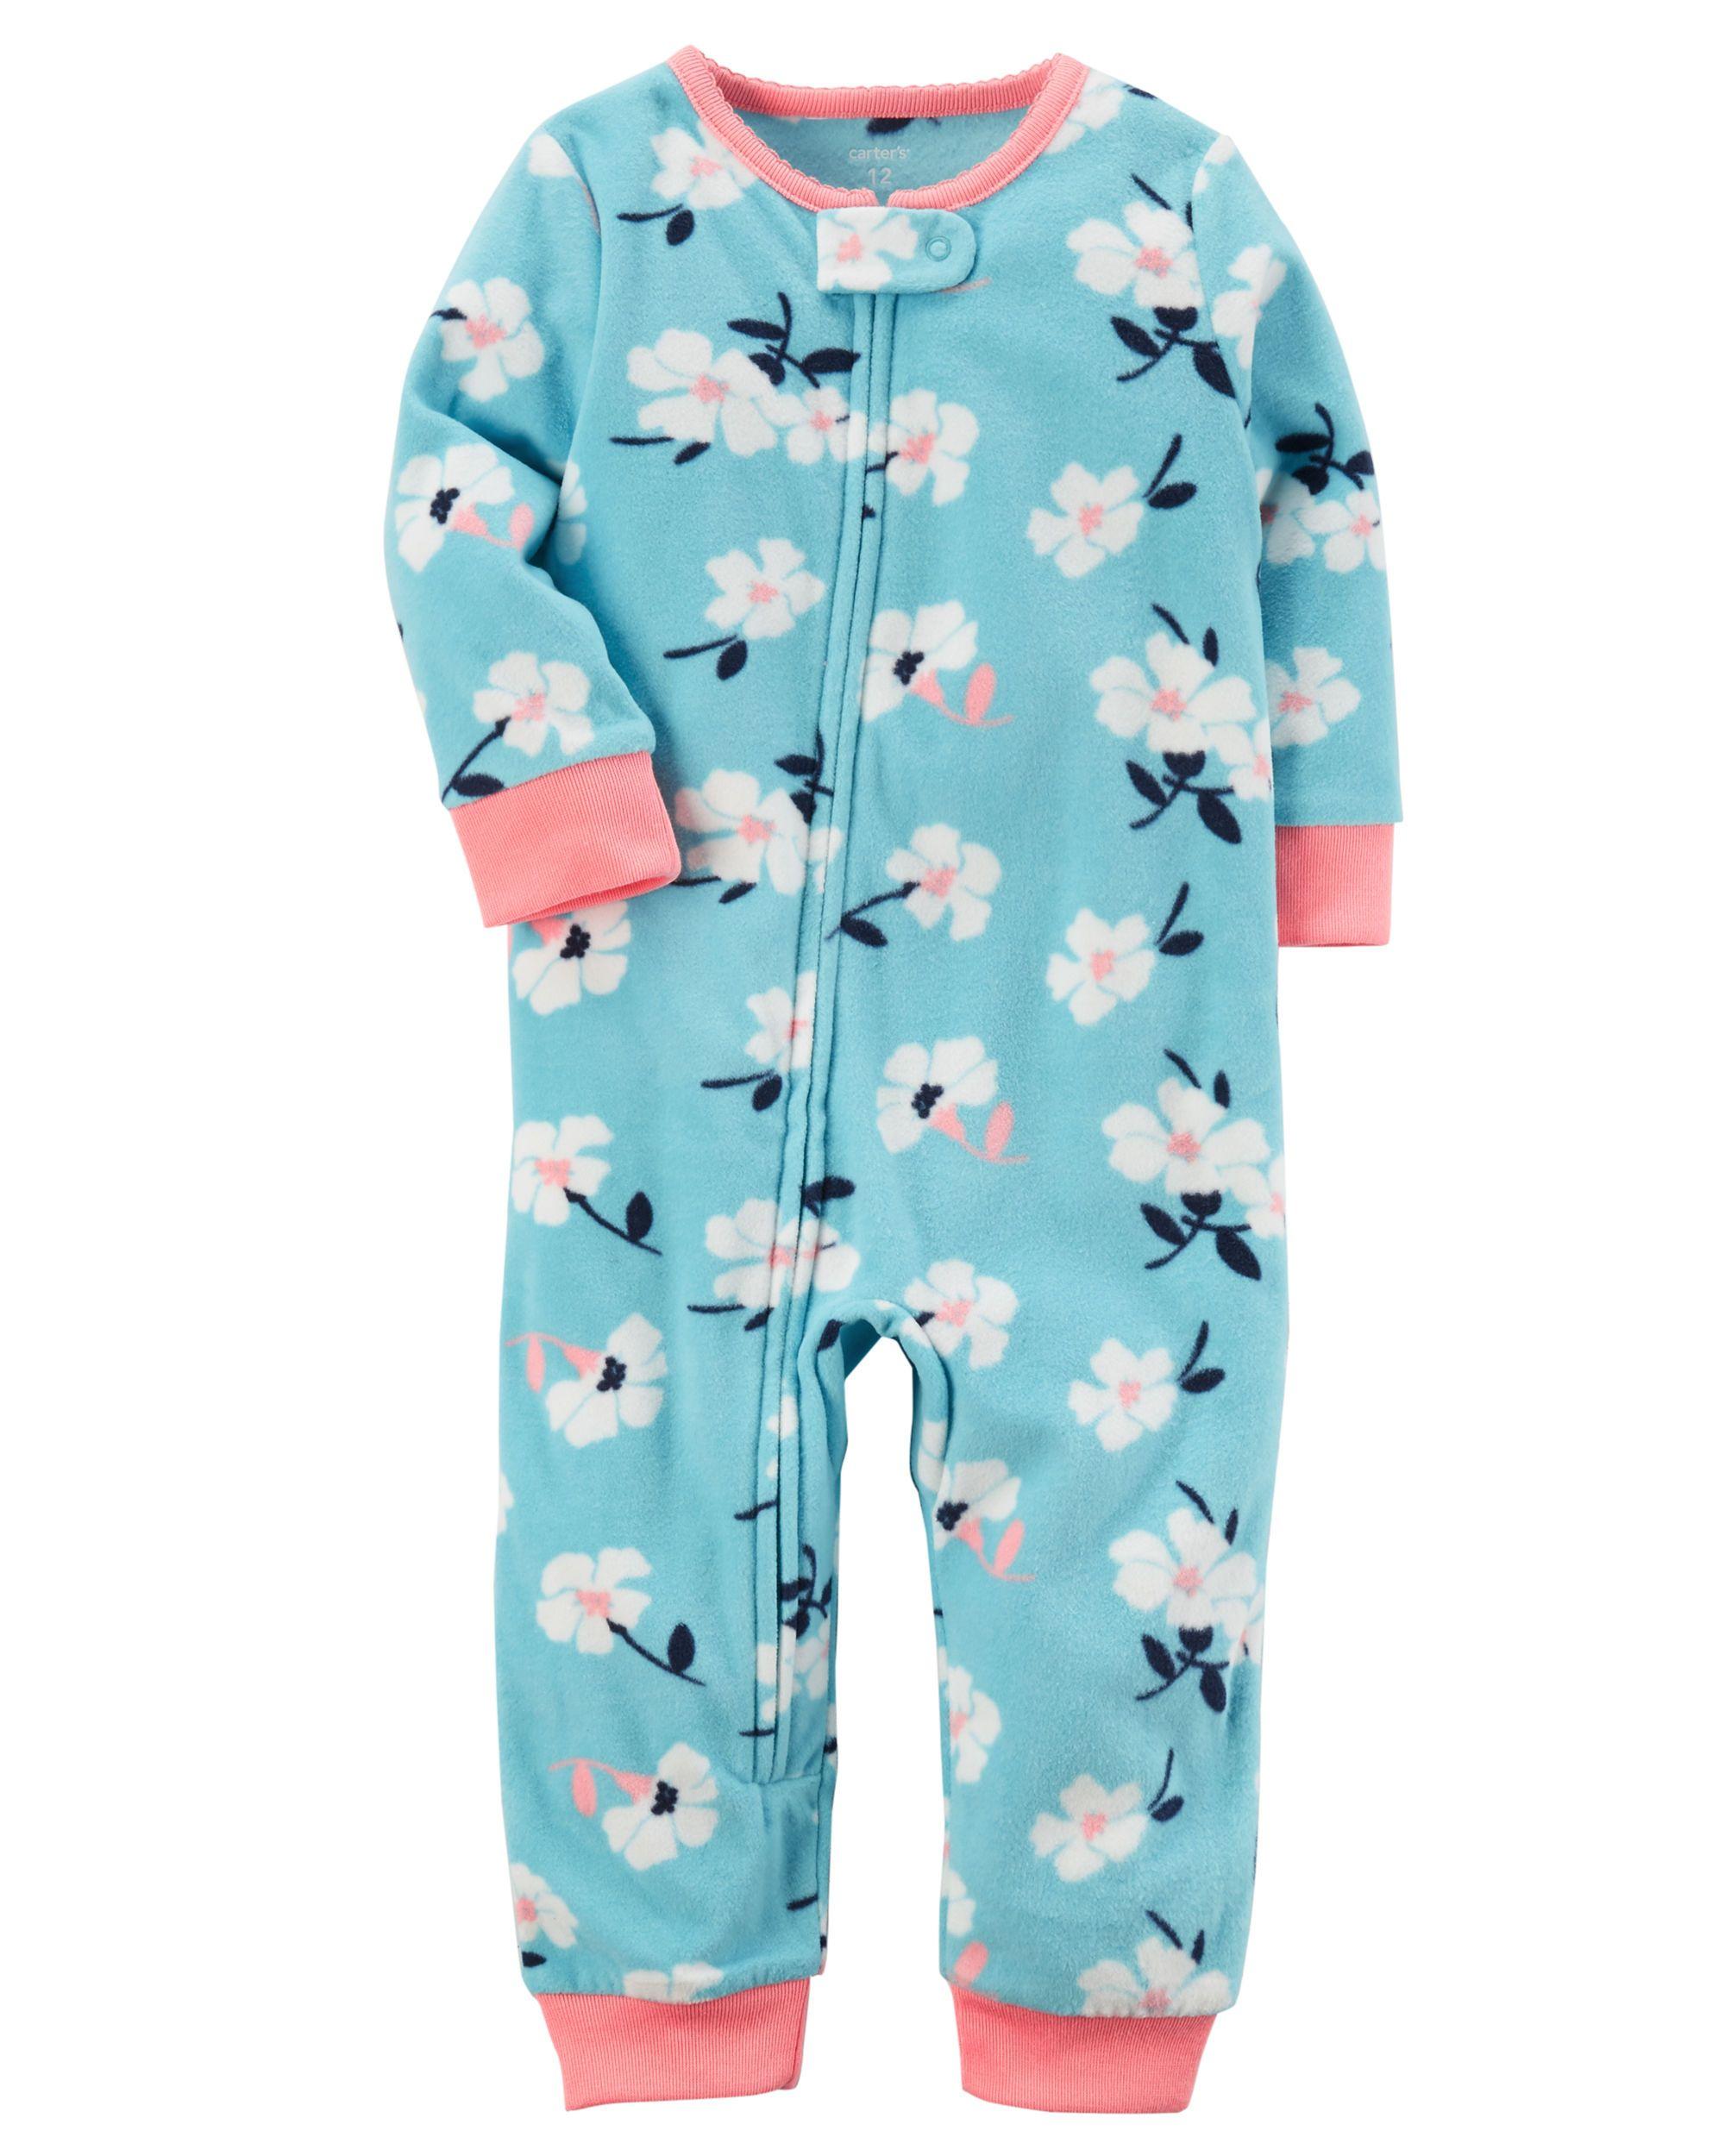 589507cbb636 1-Piece Floral Footless Fleece PJs